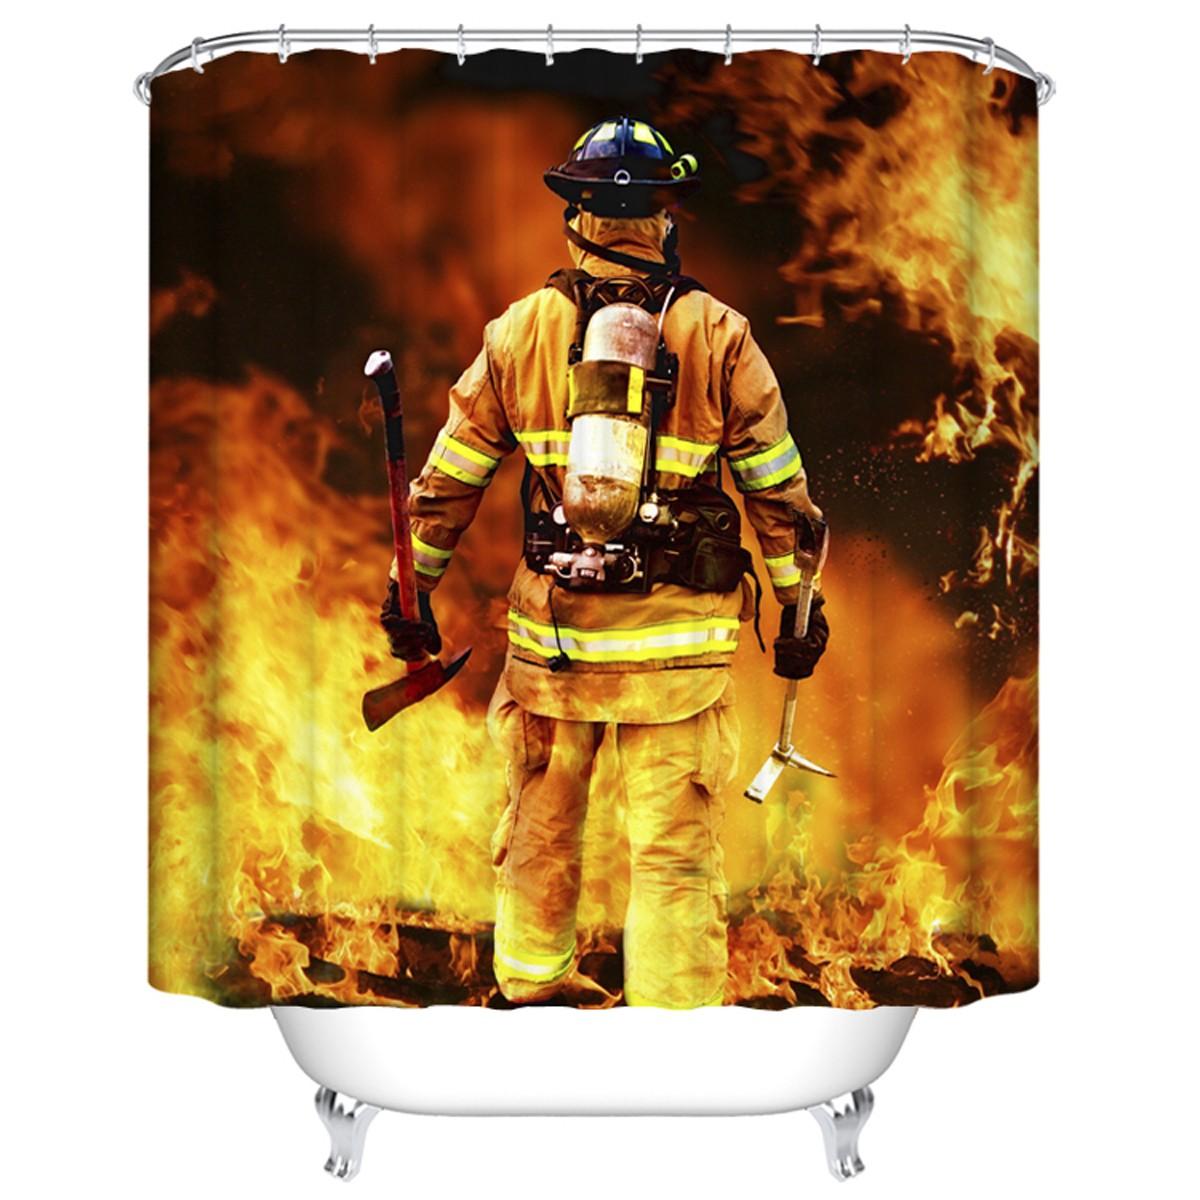 "Bathroom Waterproof Shower Curtain, 70"" W x 72"" H (DK-YT016)"